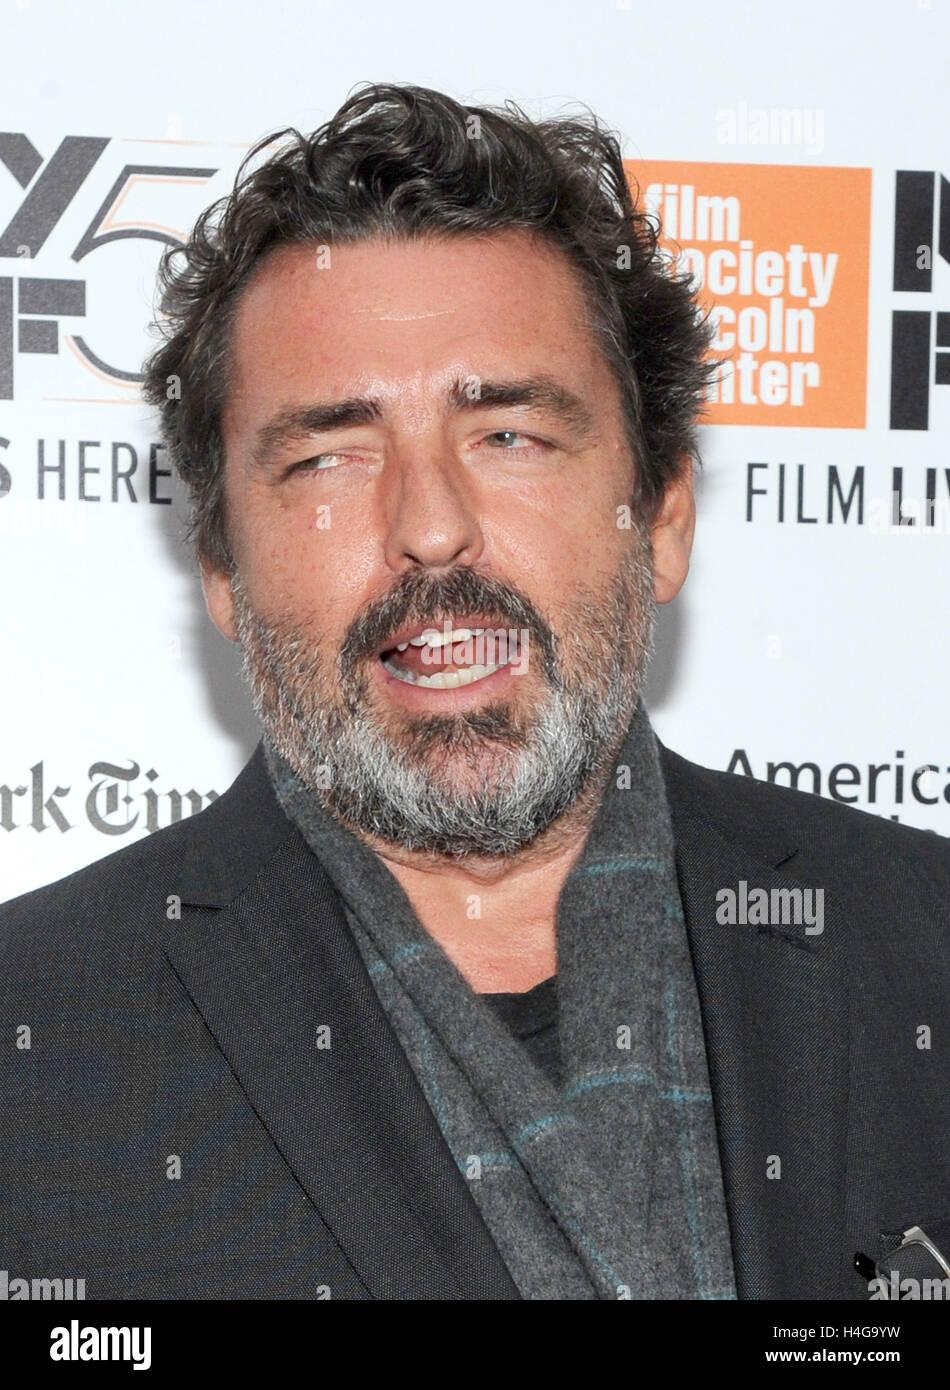 new york ny usa 15th oct 2016 actor angus macfadyen attends the